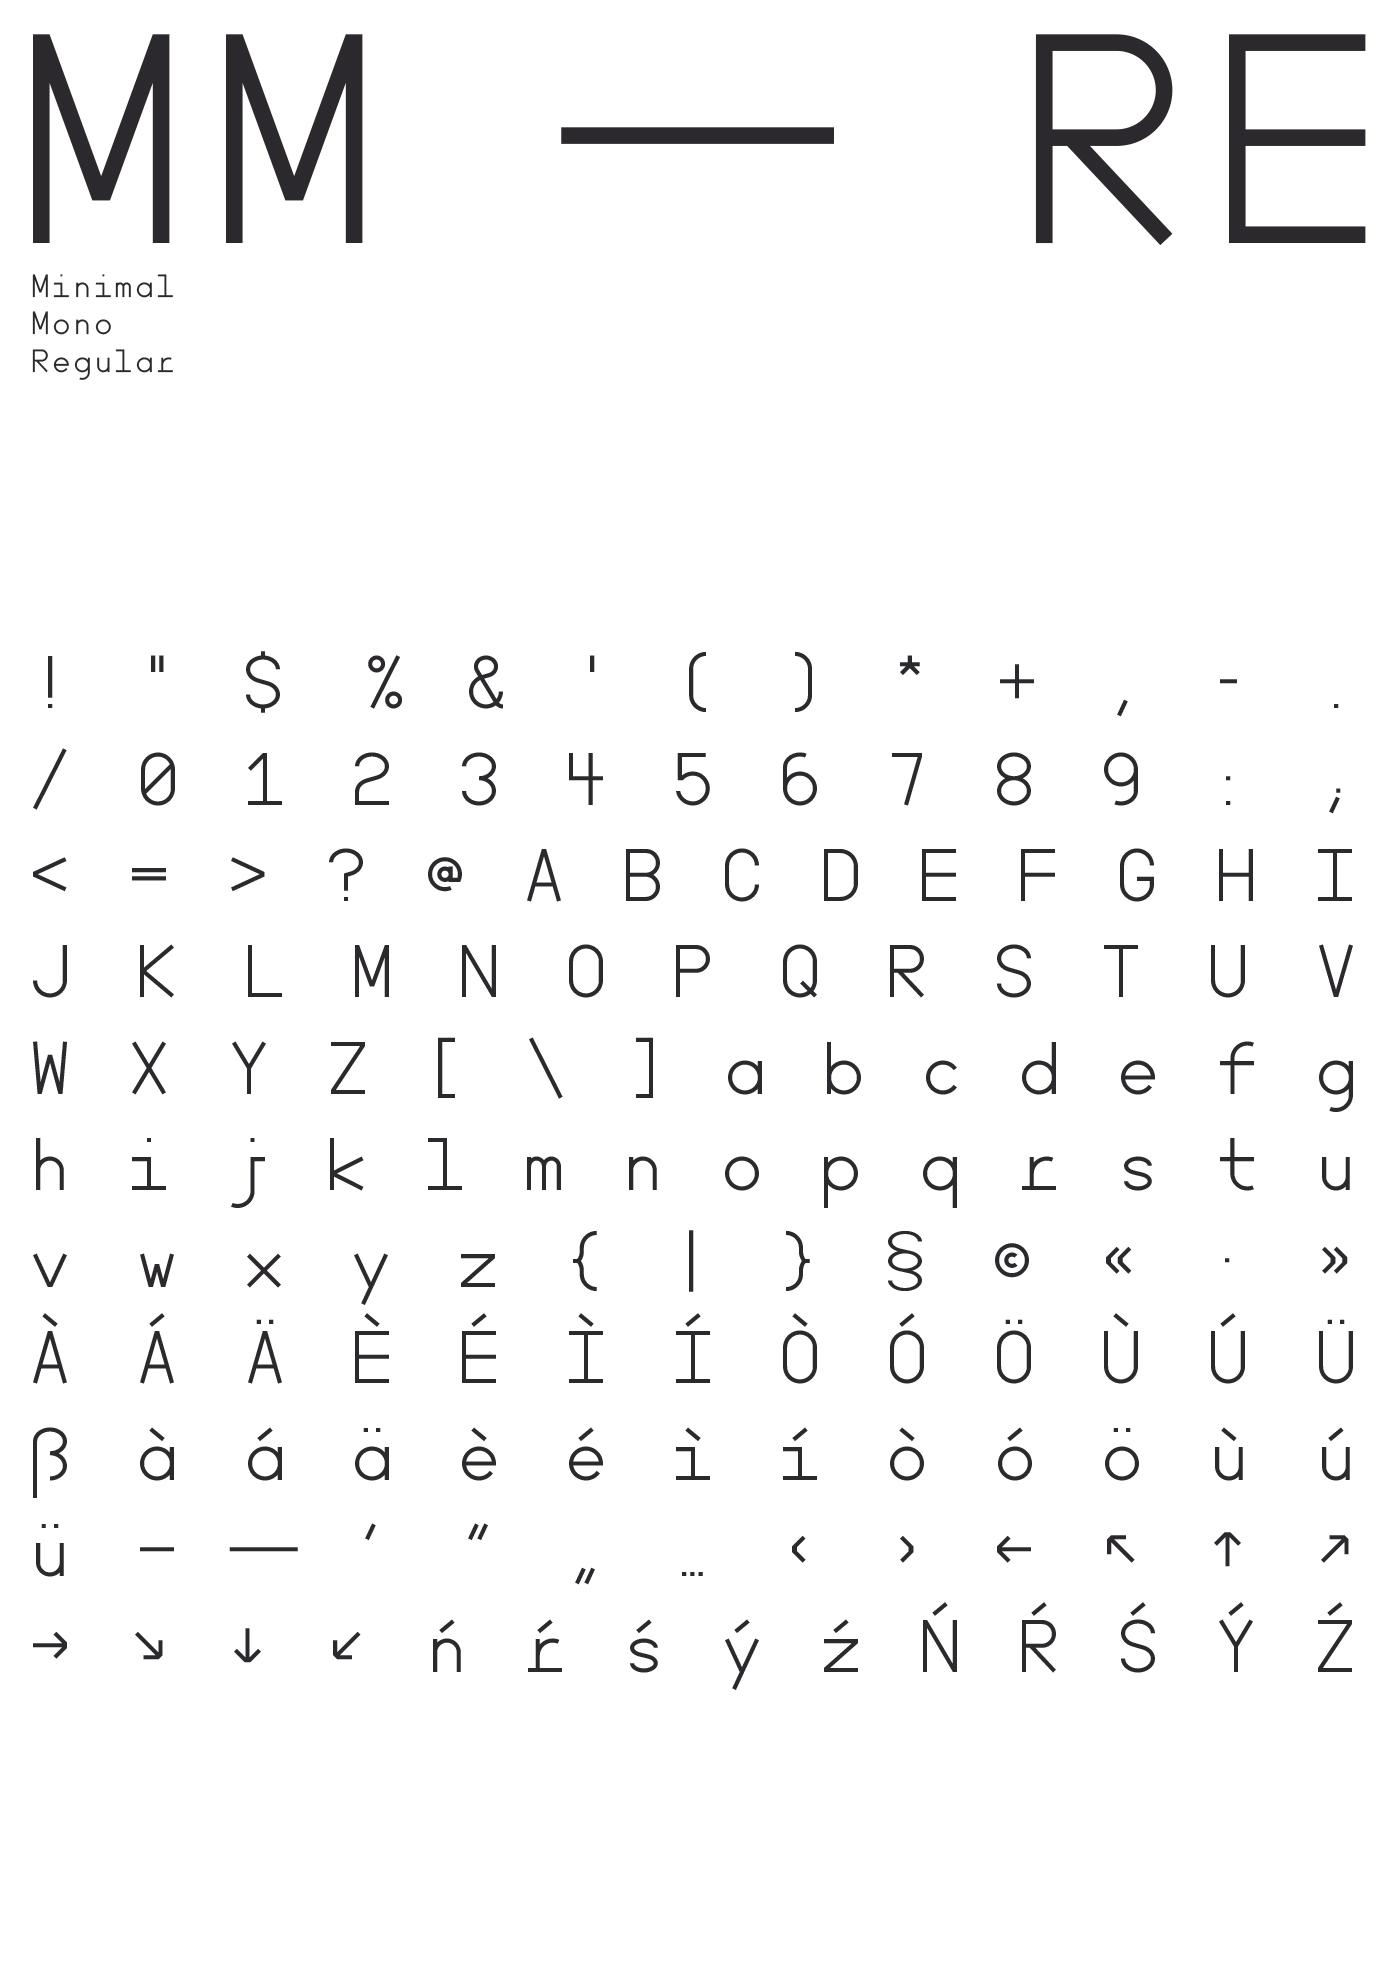 Minimal Mono — a free font on Behance